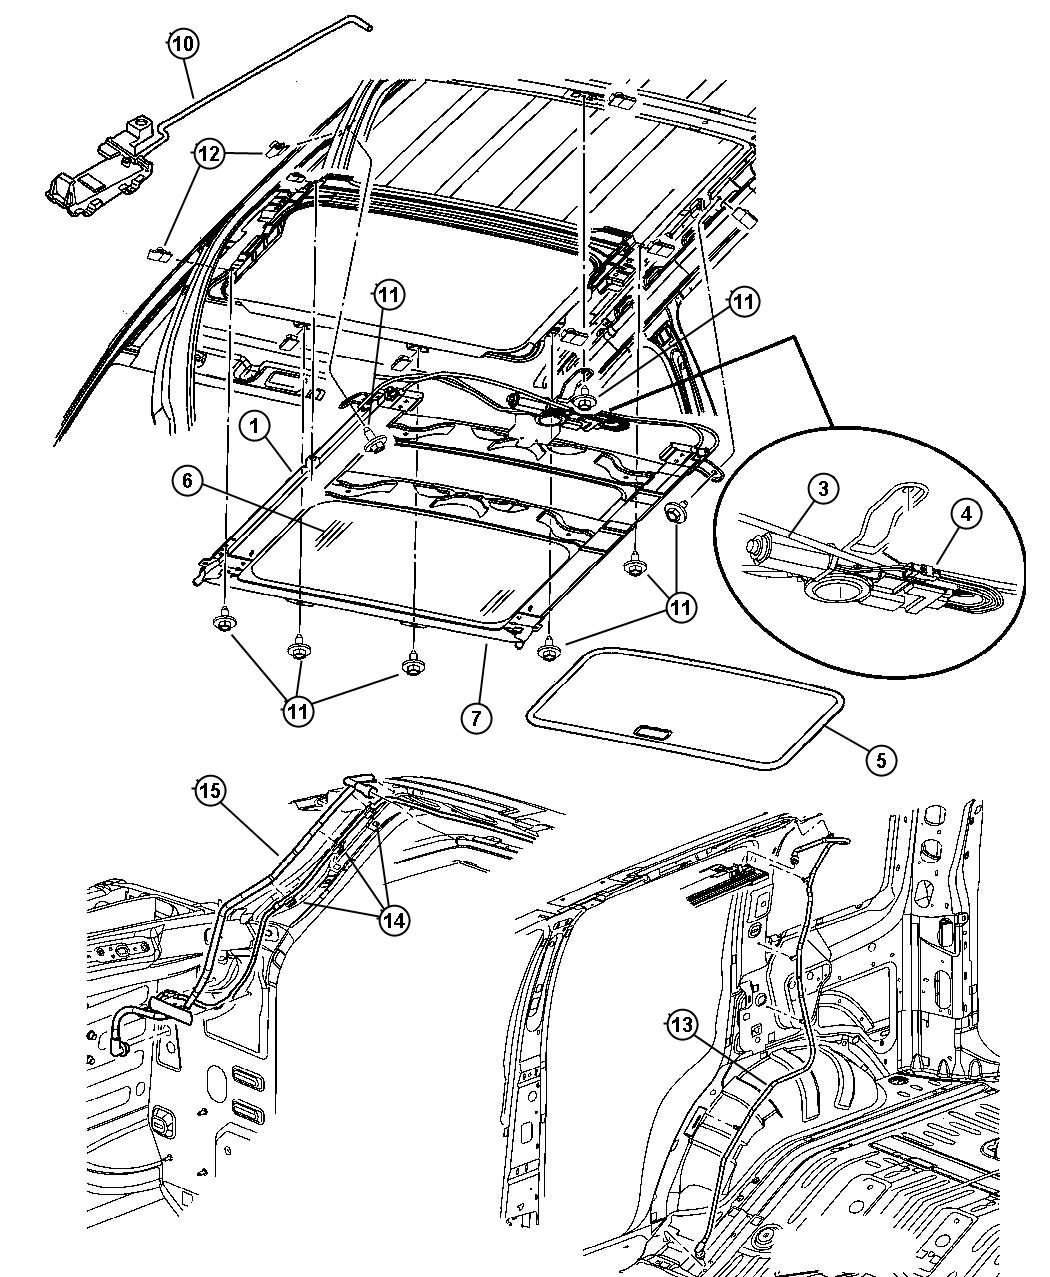 Jeep Liberty Parts Manual Images